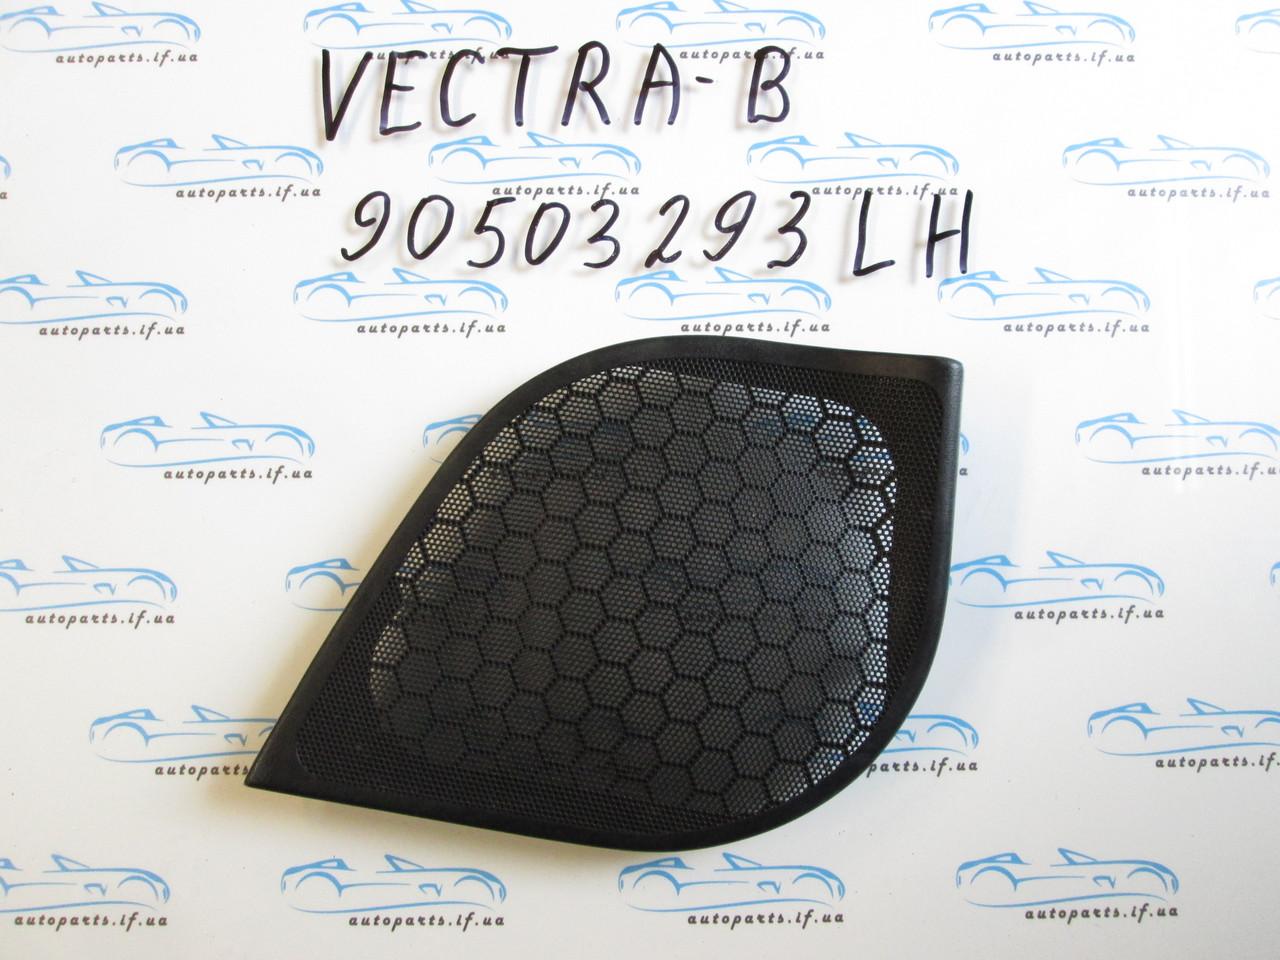 Накладка динамика Вектра Б, opel Vectra B 90503293 левая зад